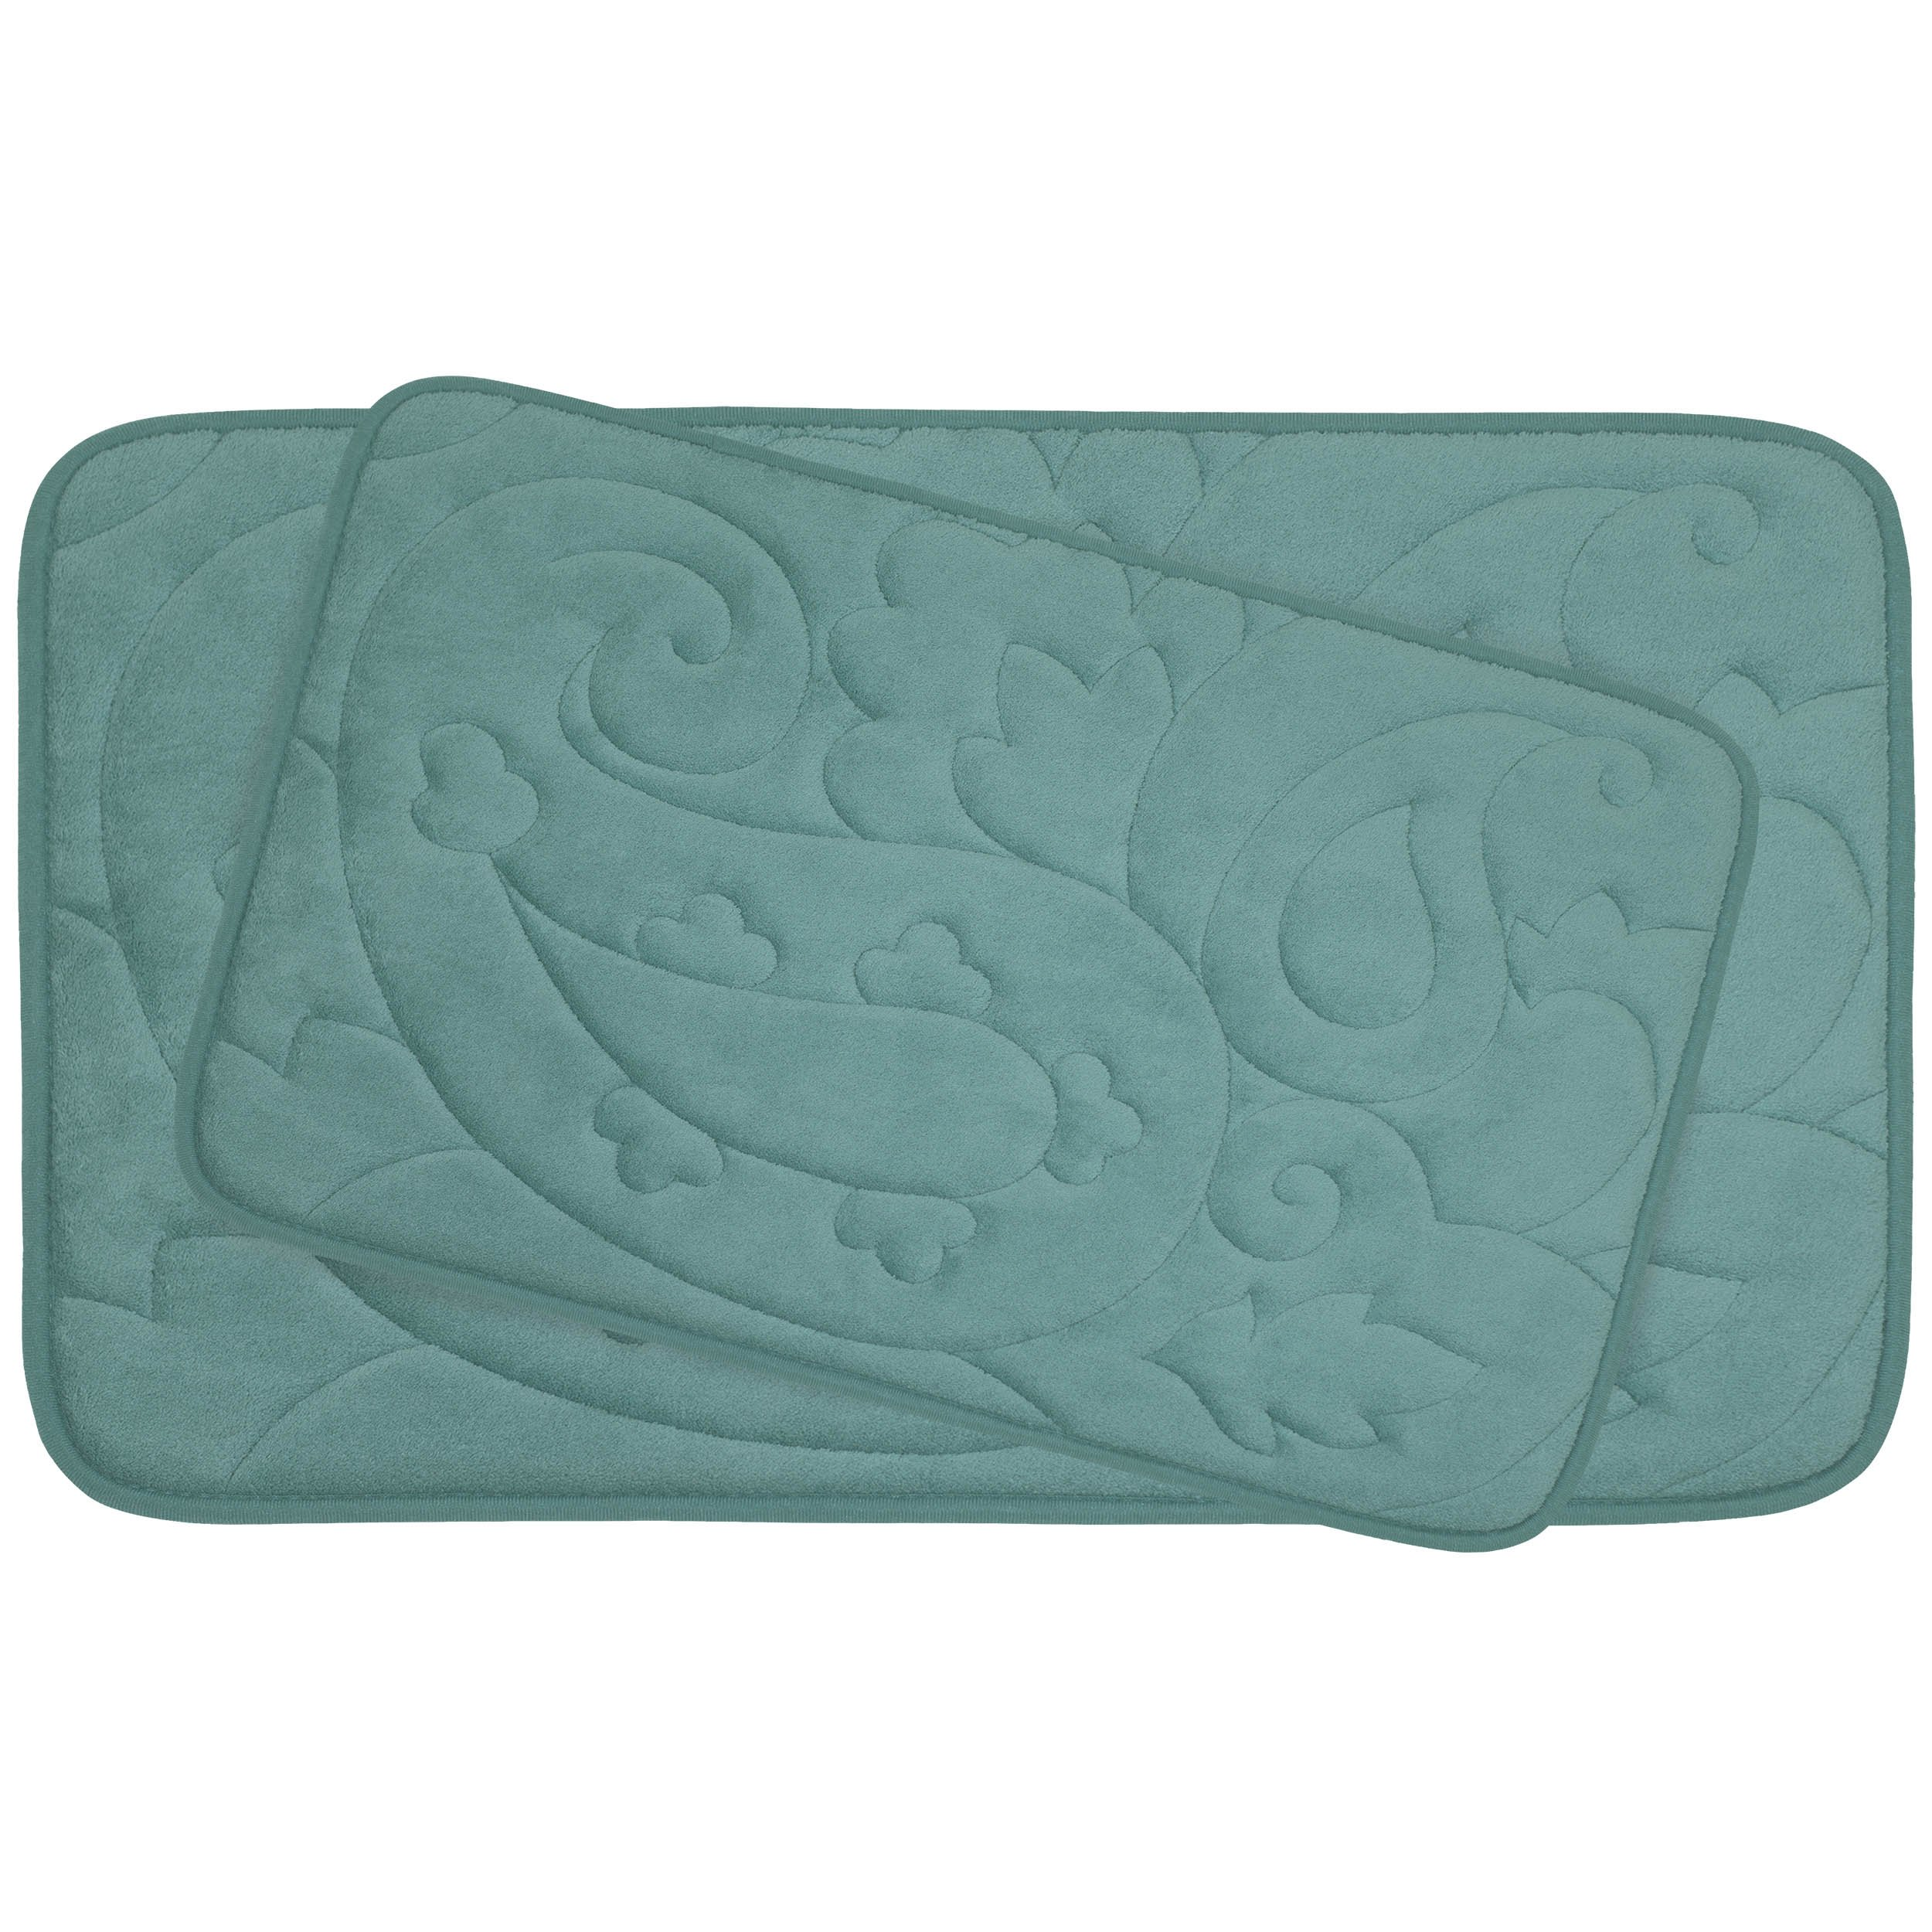 Bounce Comfort 2 Piece Pelton Micro Plush Memory Foam Bath Mat Set, 20 by 32'', Marine Blue